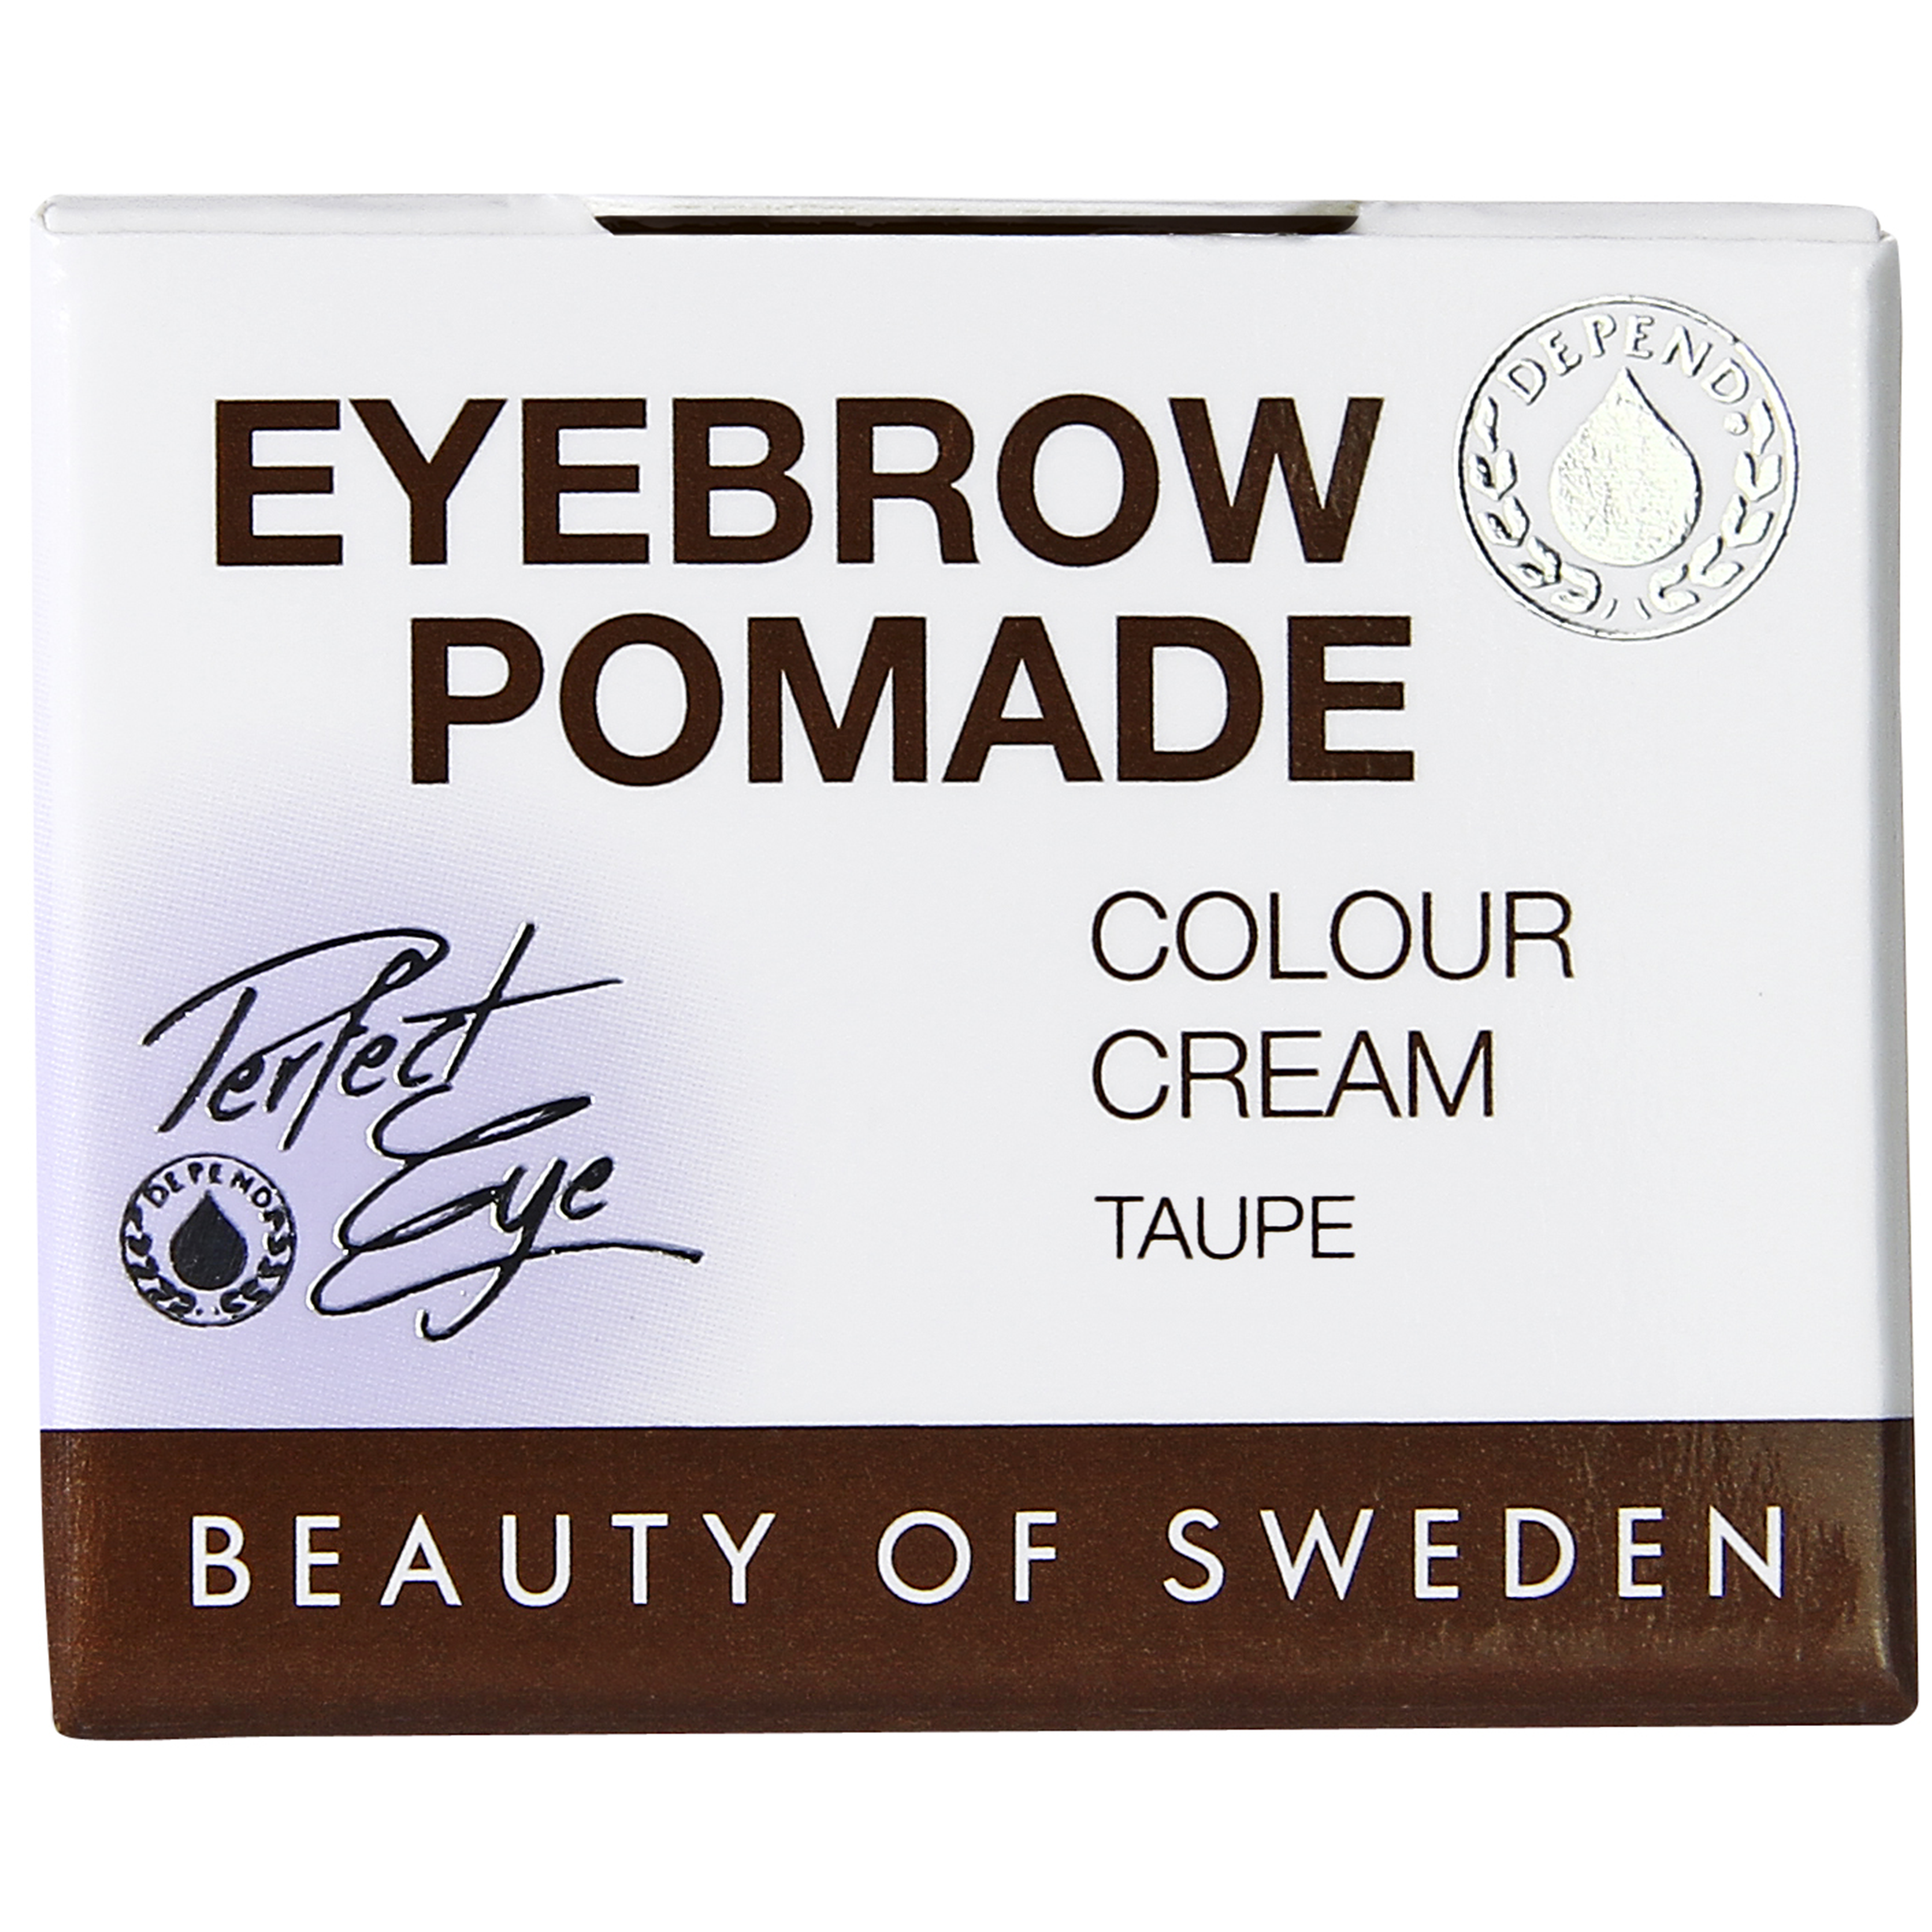 Eyebrow Pomade Colour Cream Taupe